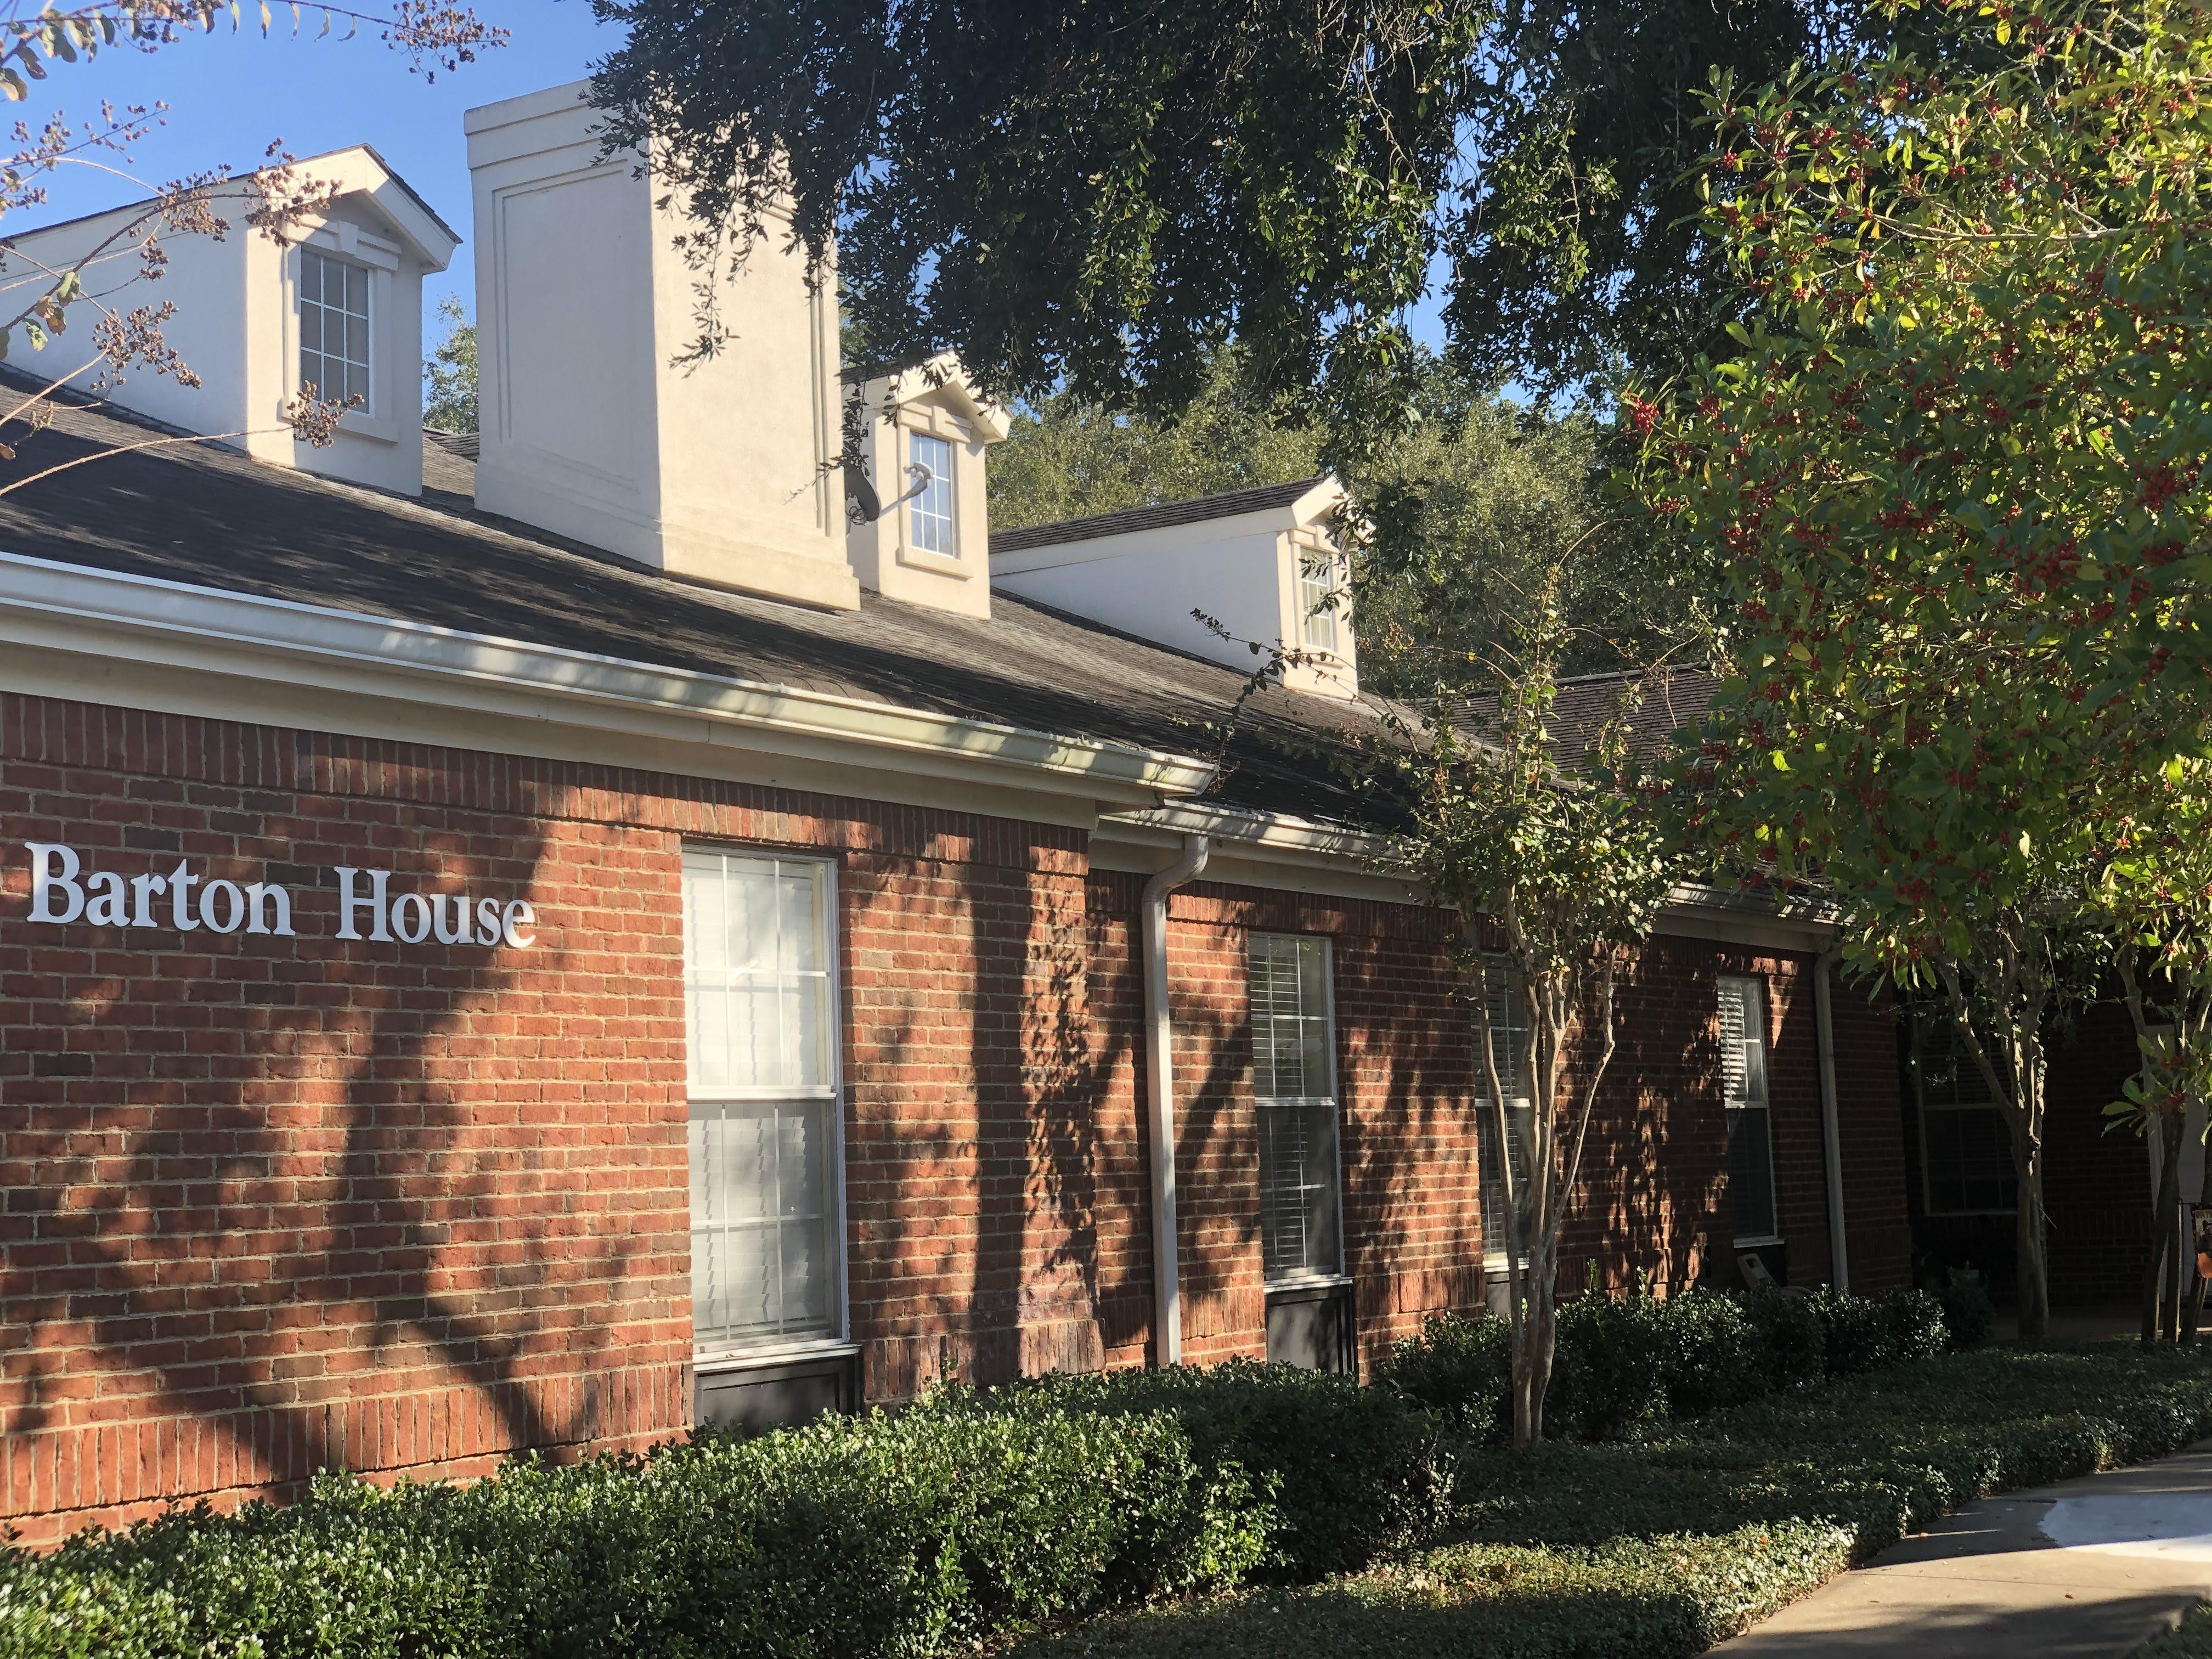 Photo 1 of Barton House